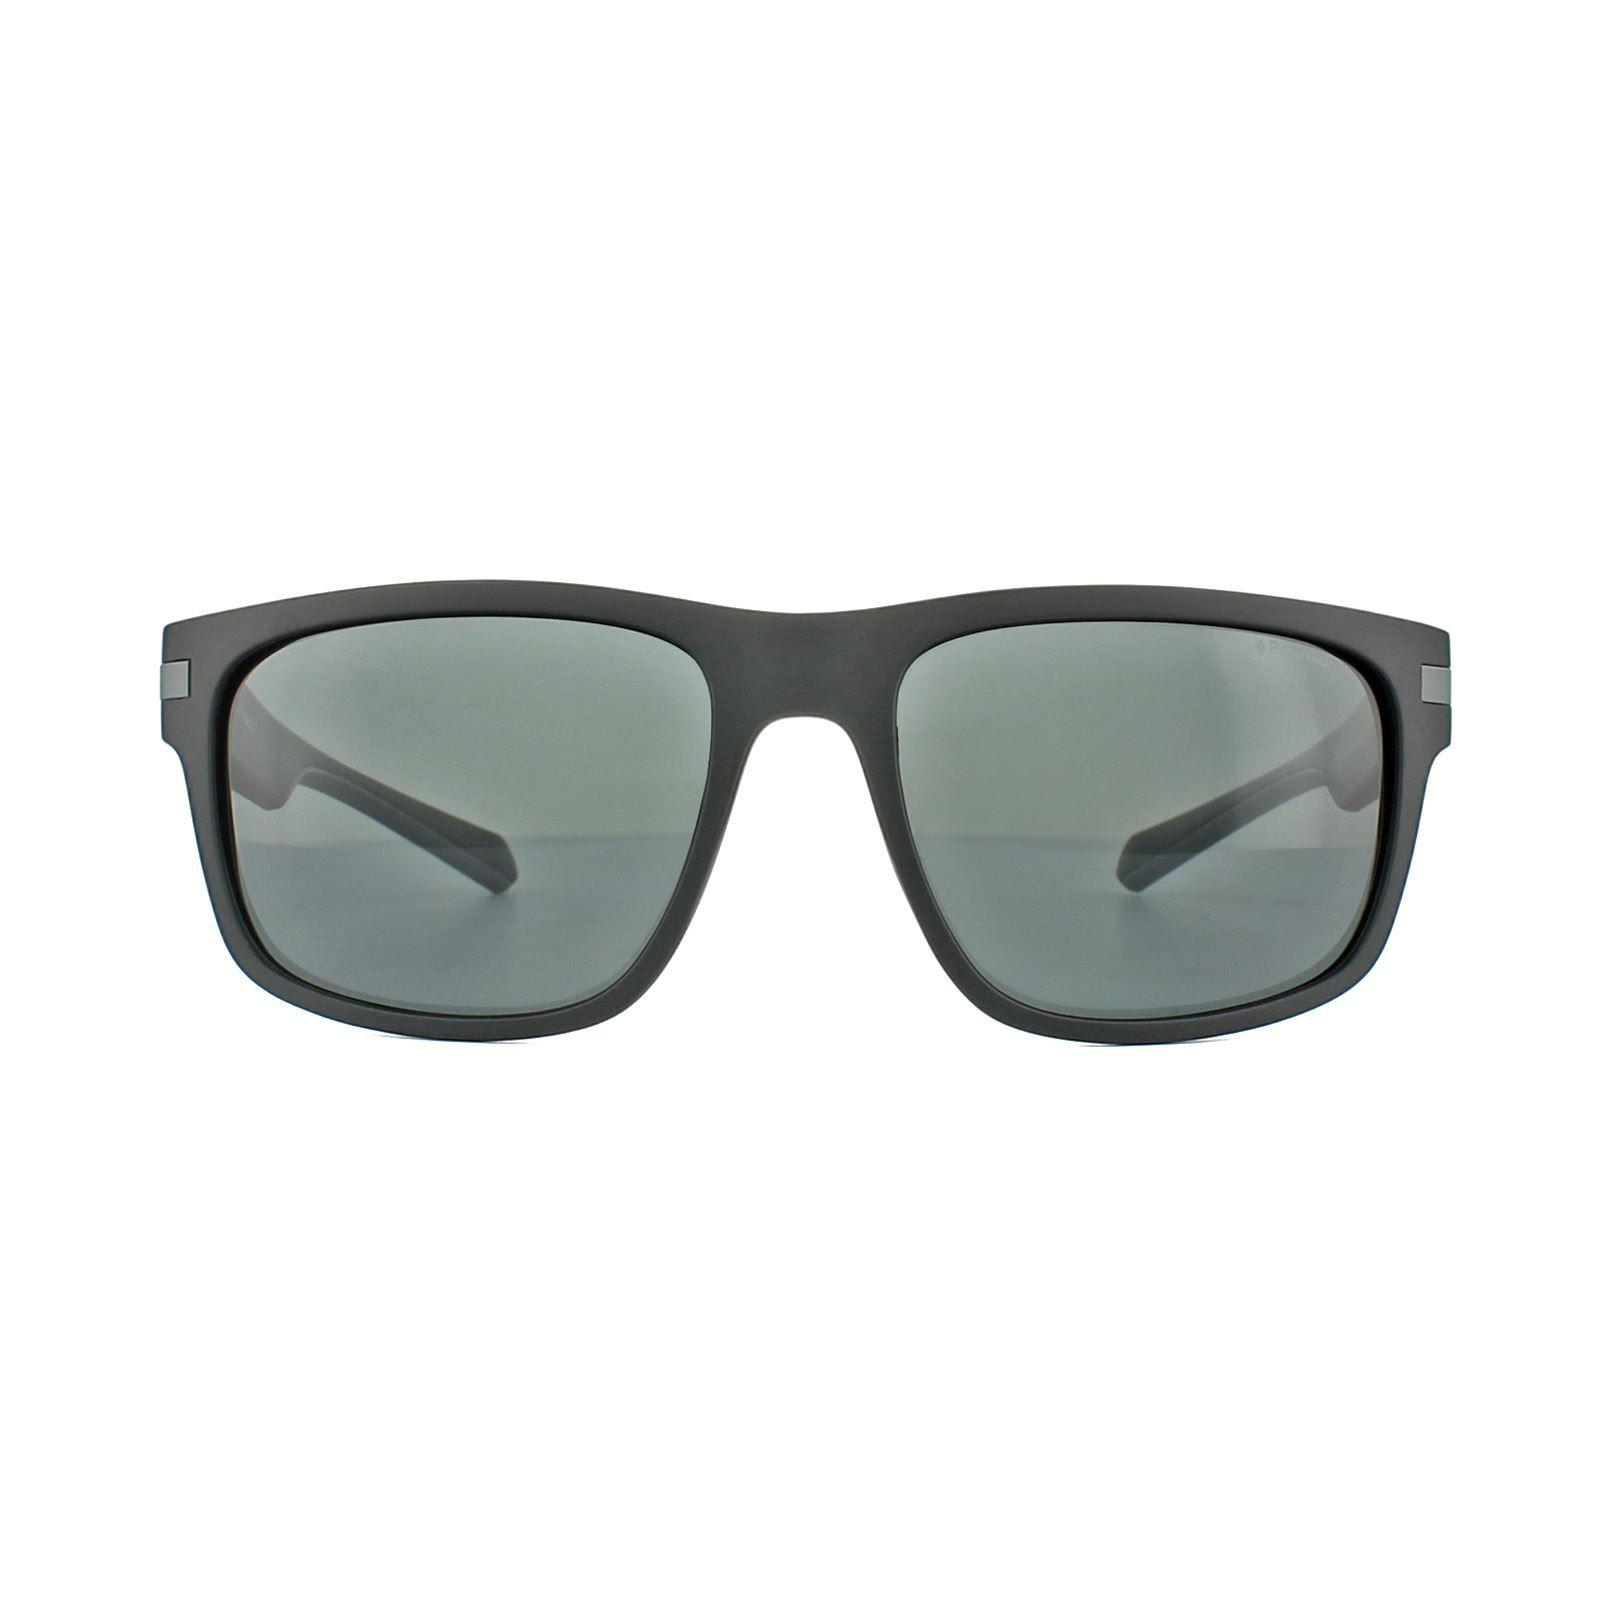 Polaroid Sunglasses PLD 2066/S 003 M9 Matt Black Grey Polarized